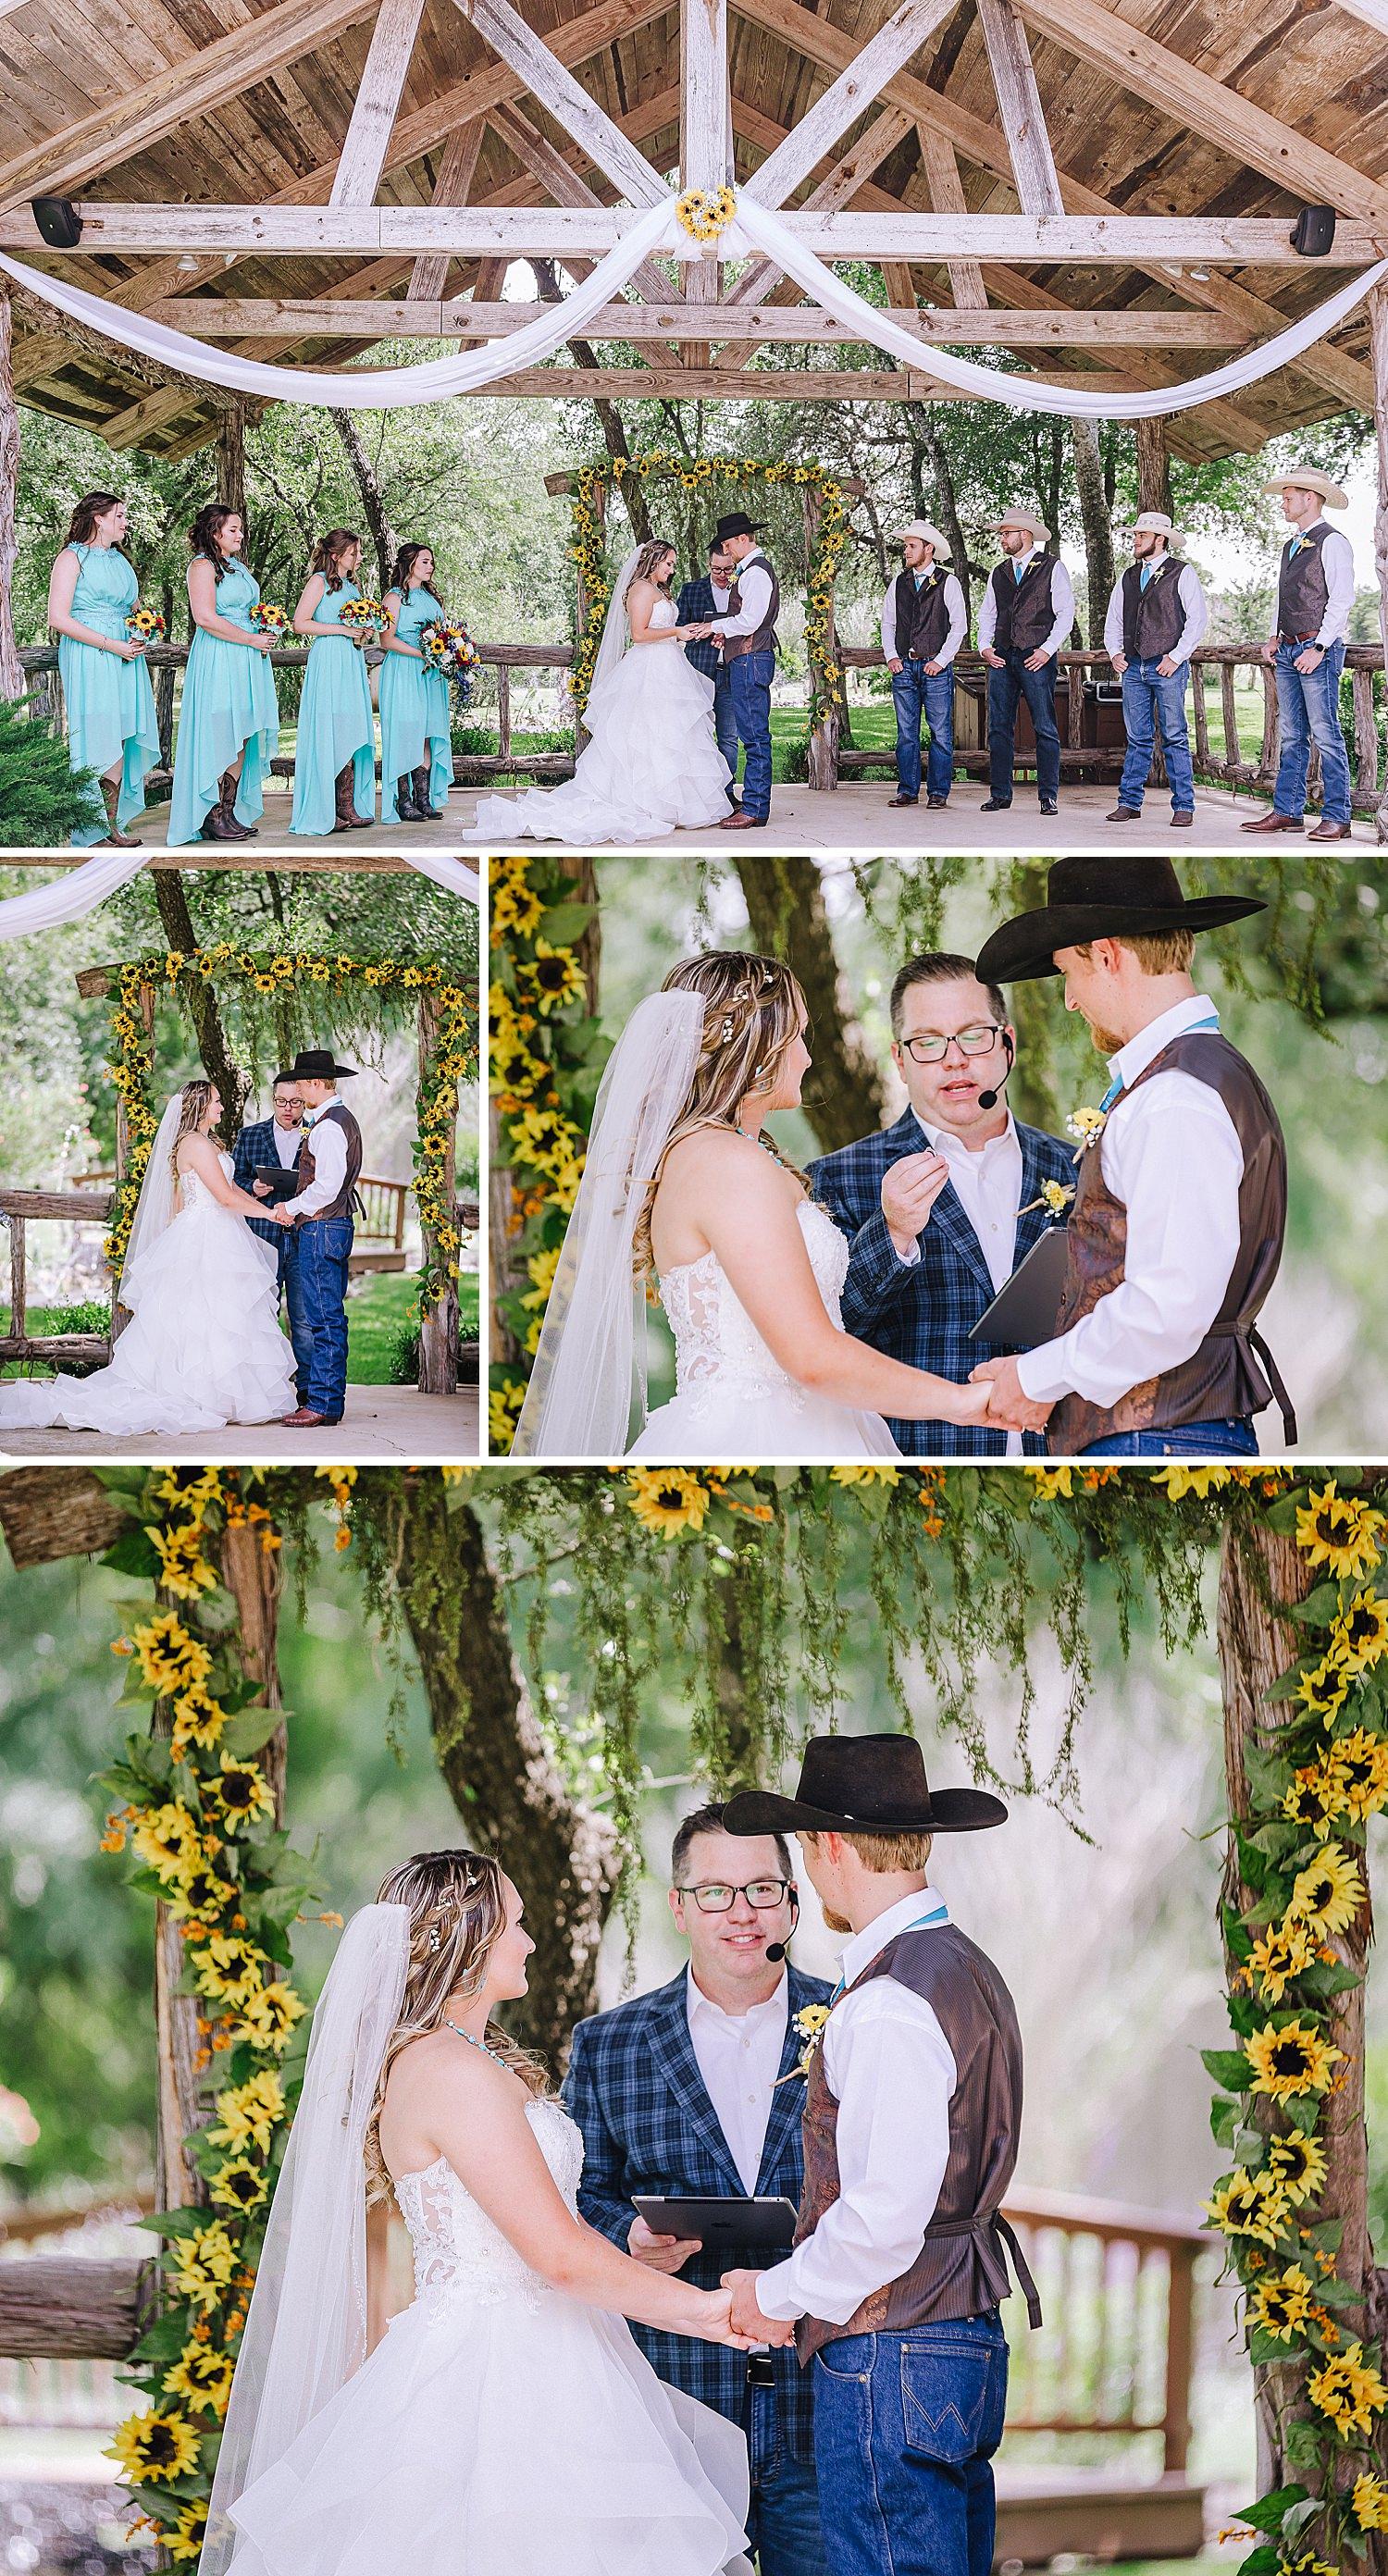 Carly-Barton-Photography-Old-Town-Texas-Rustic-Wedding-Photos-Sunflowers-Boots-Kyle-Texas_0039.jpg